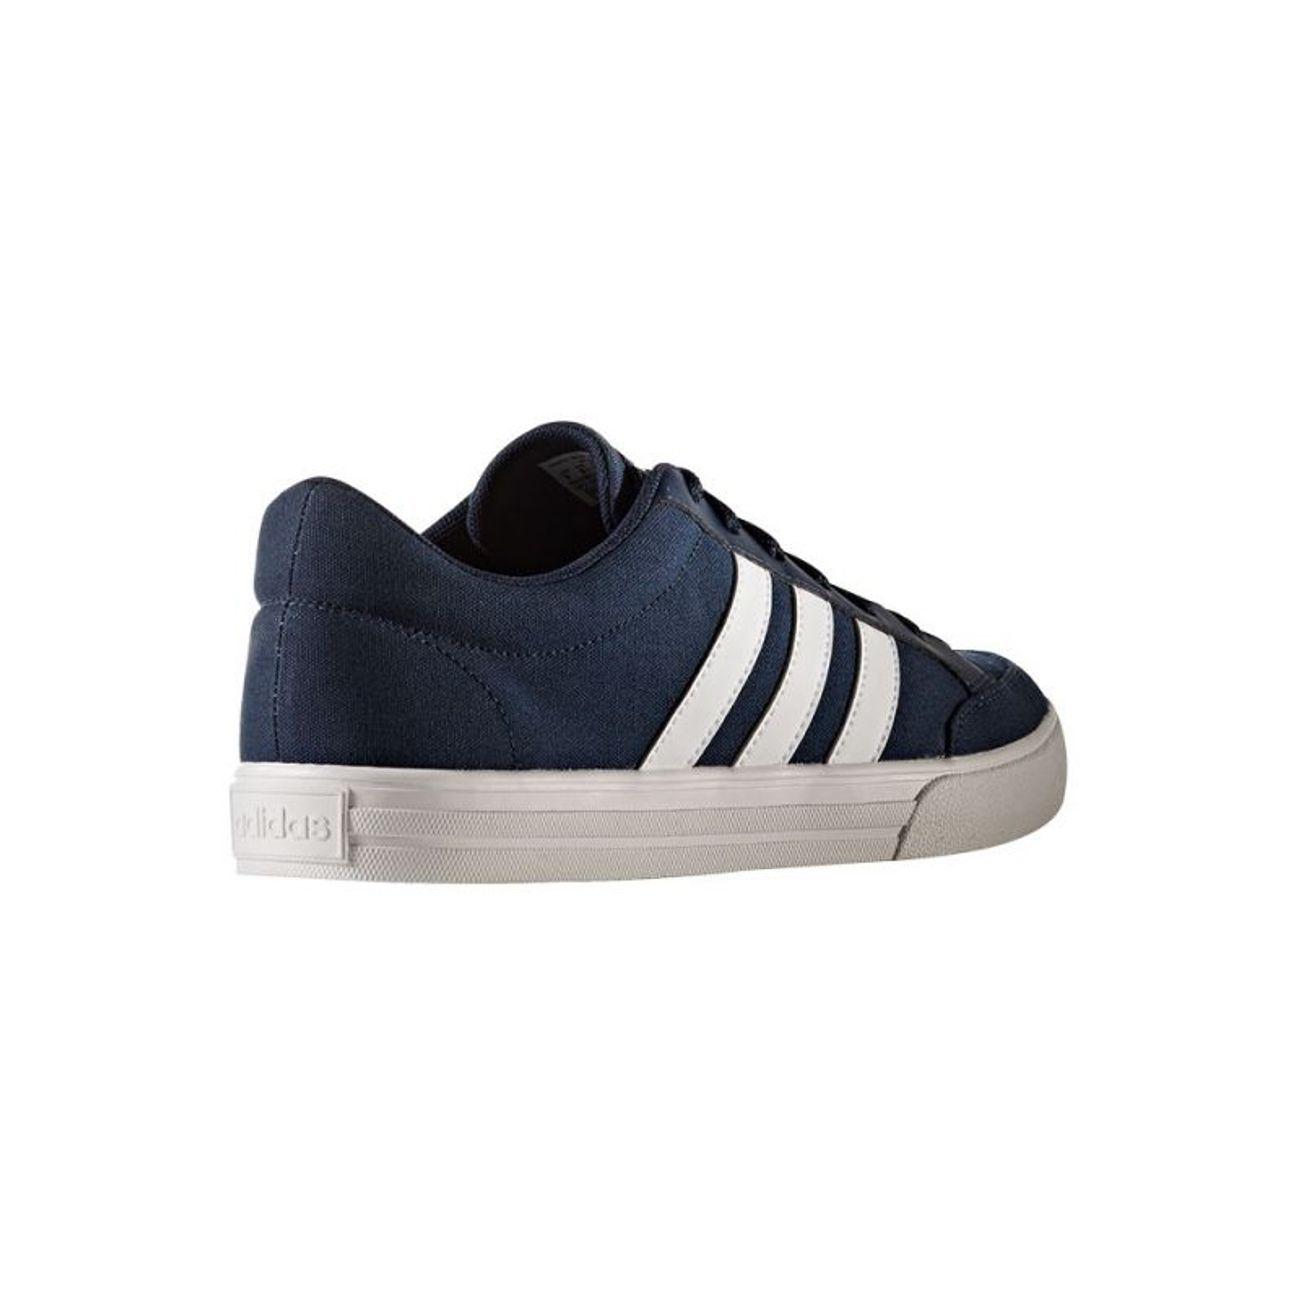 adidas neo vs set bleu baskets mode homme moins cher